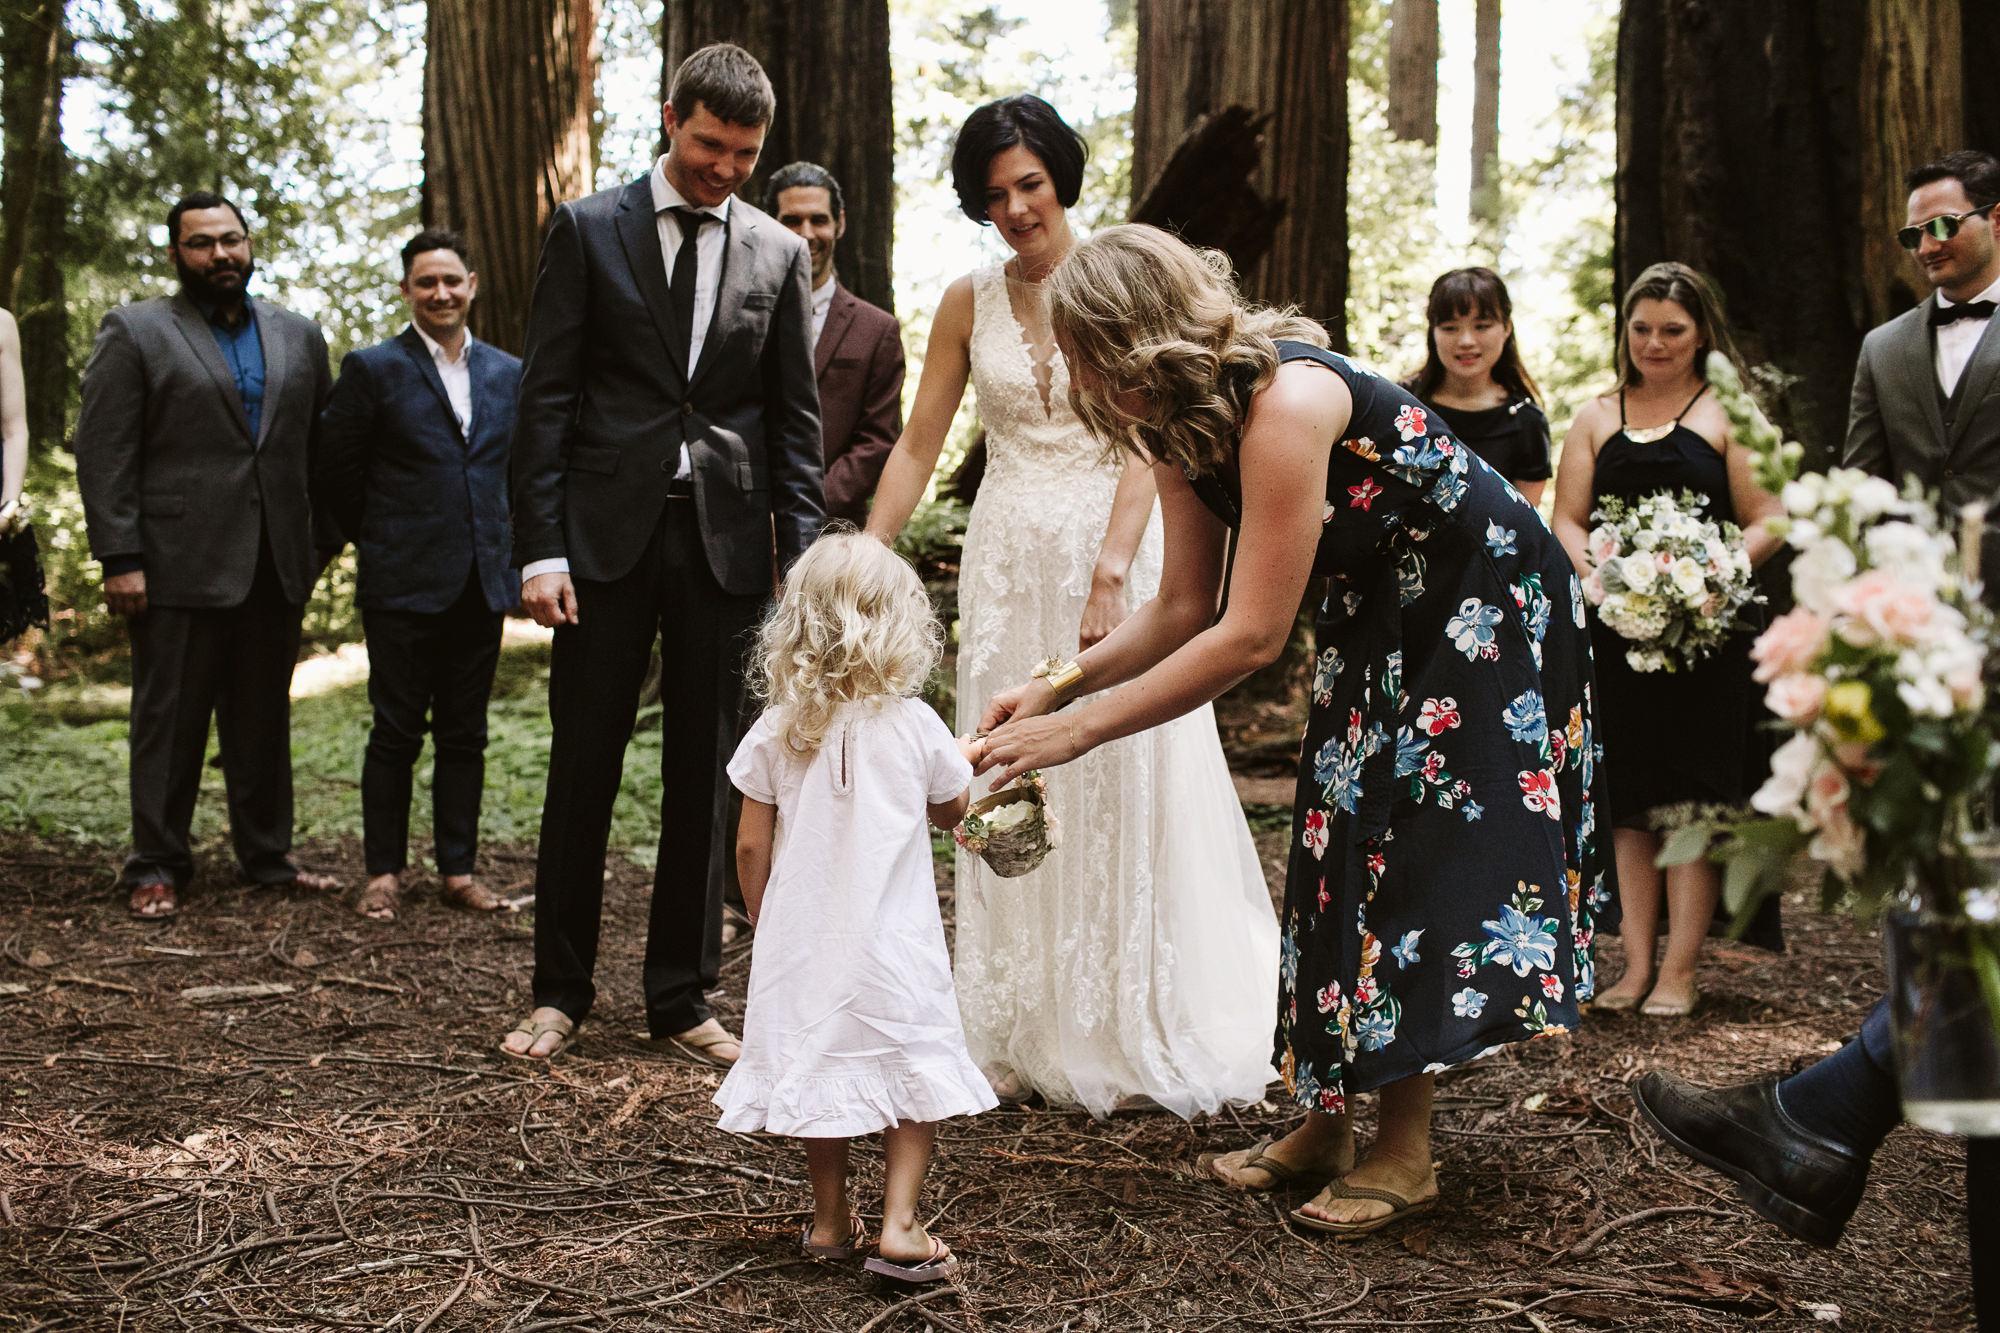 California-wedding-photographer-alfonso-flores-pamplin-groove-210.jpg